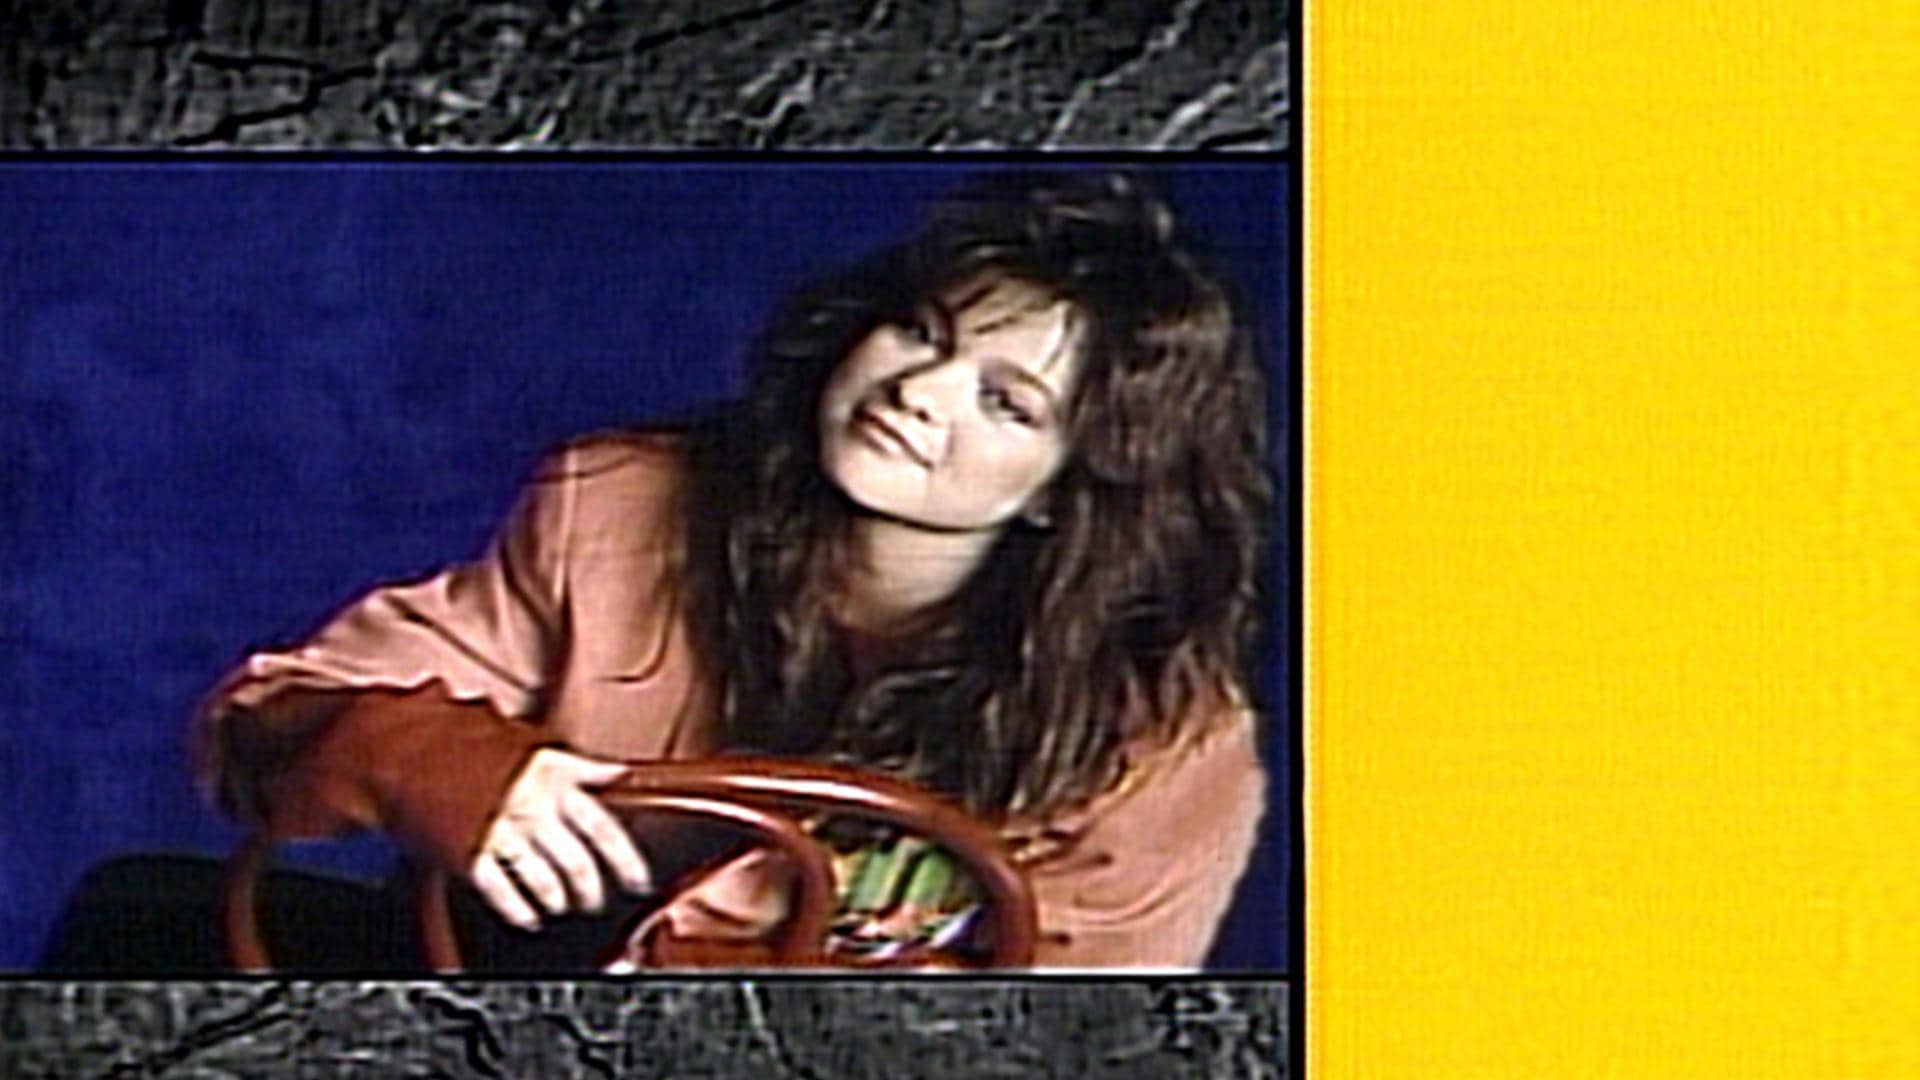 Valerie Bertinelli: February 28, 1987